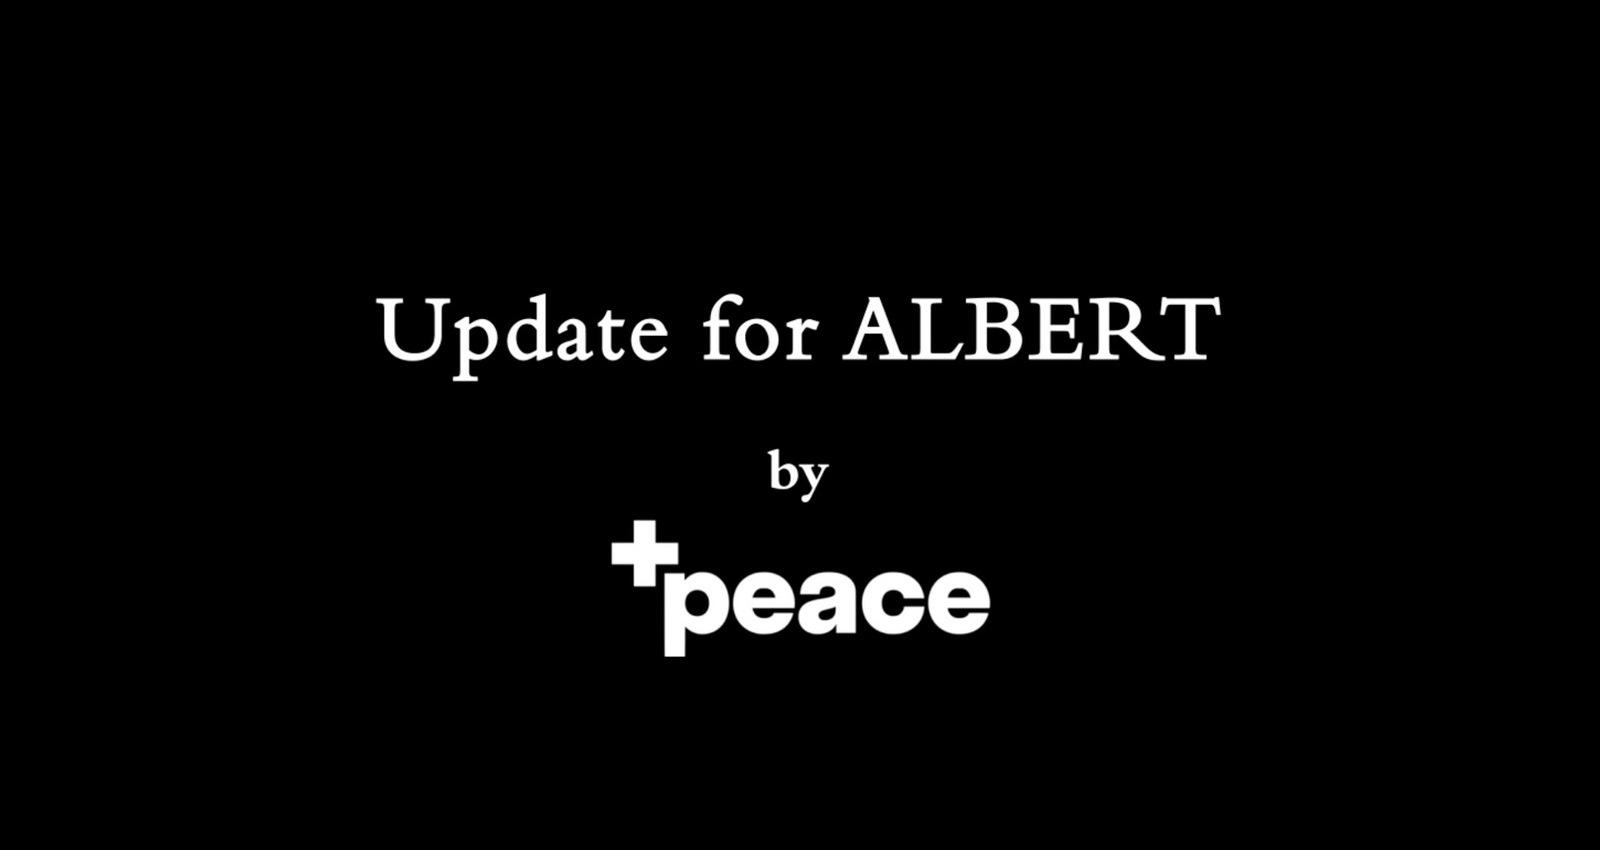 Update for Albert